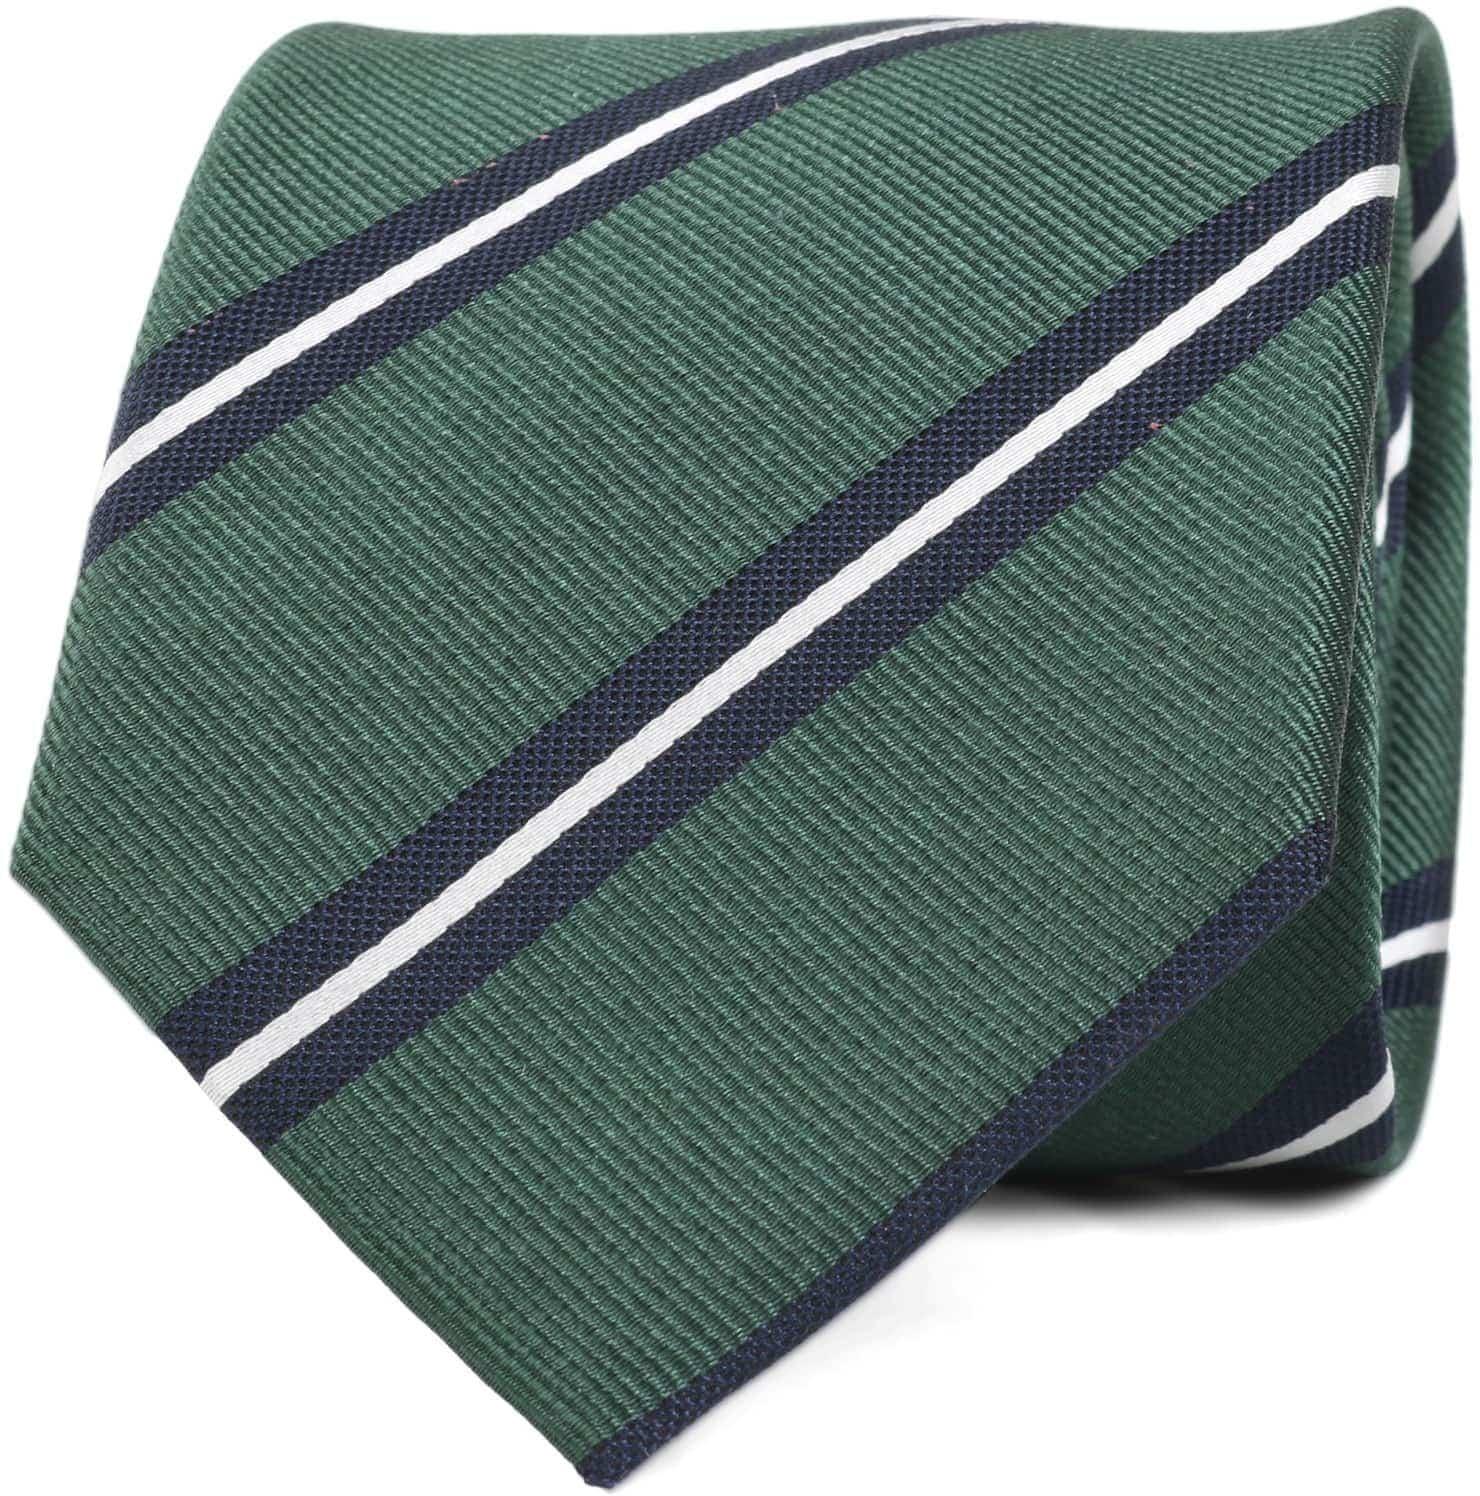 Krawatte Seide Grün Streifen foto 0